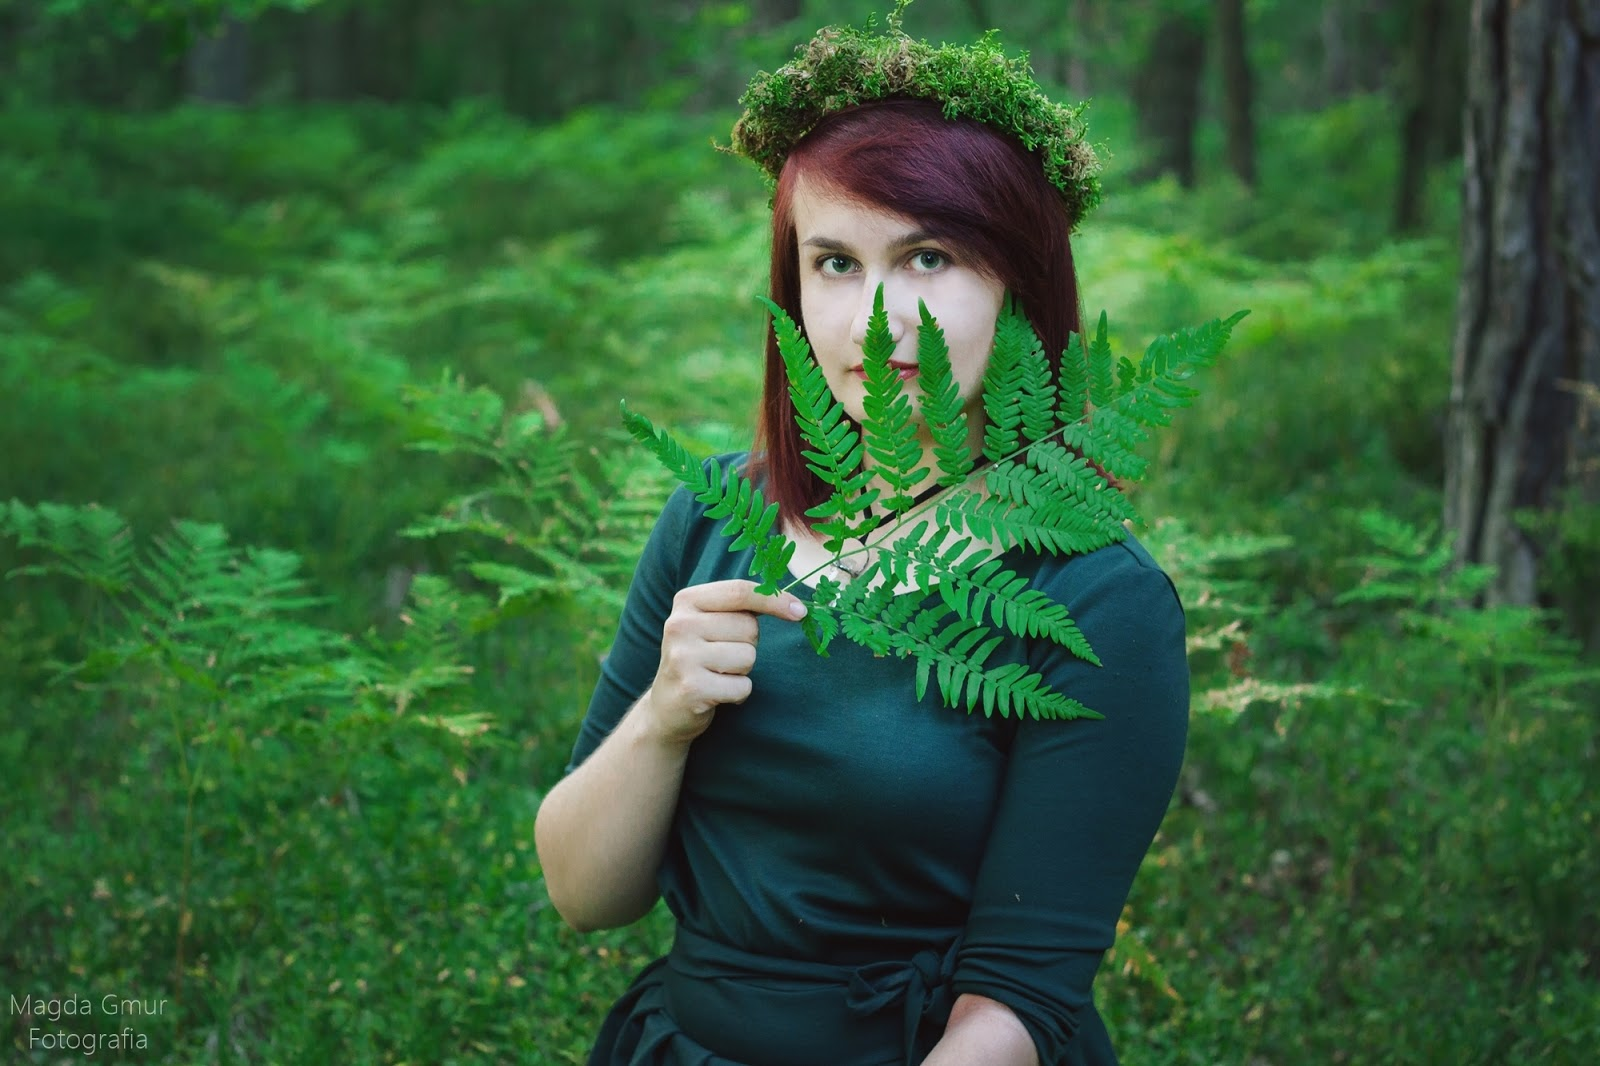 Sesja w lesie, zieleń, rogi jelenia sesja, rogi sesja, paprocie